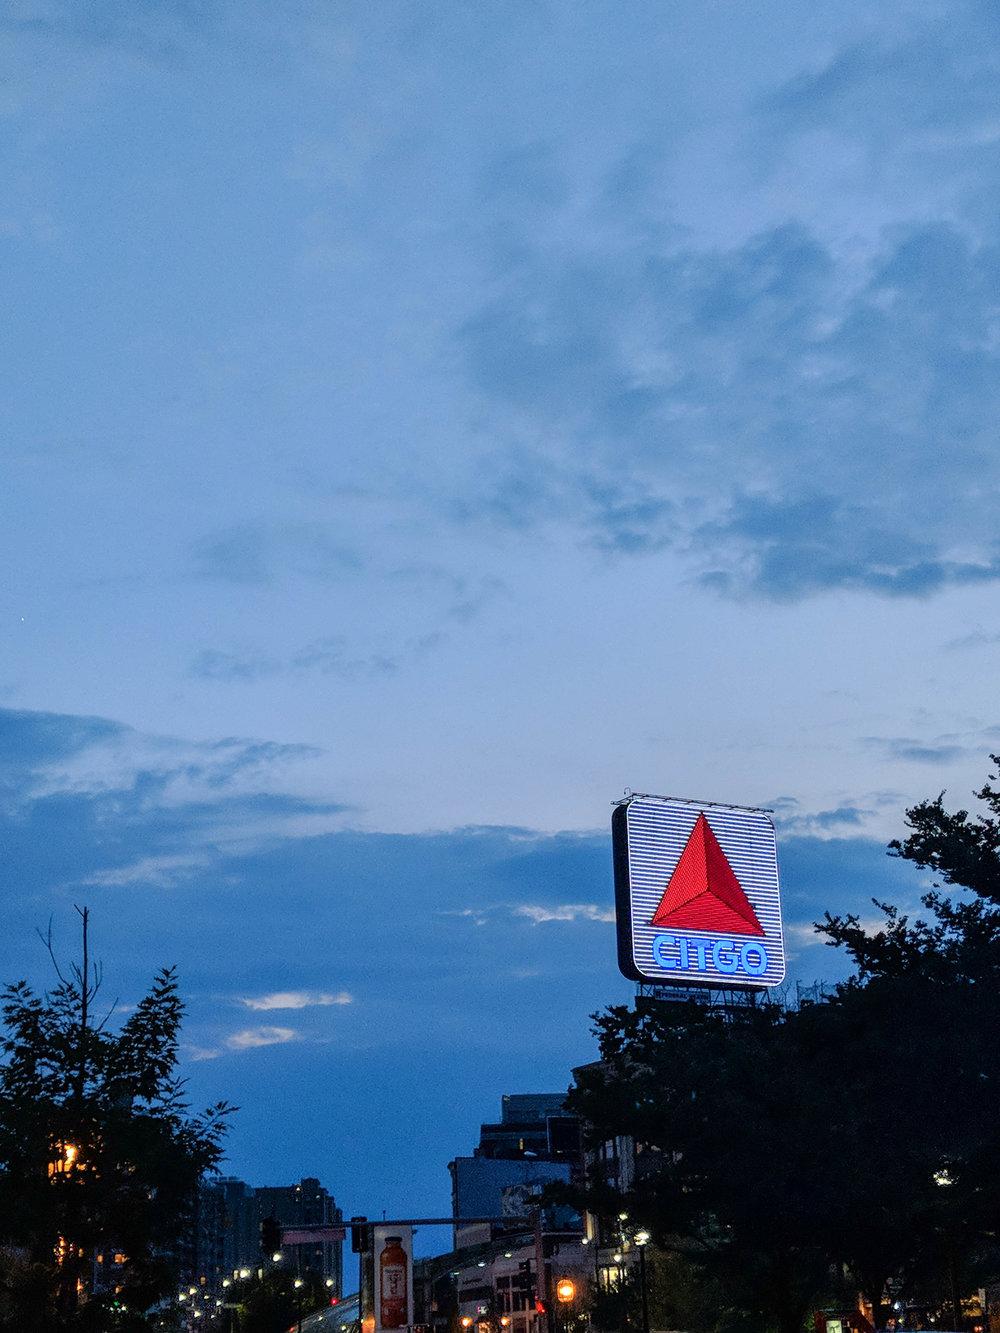 bri rinehart; citgo; fenway; boston; photography